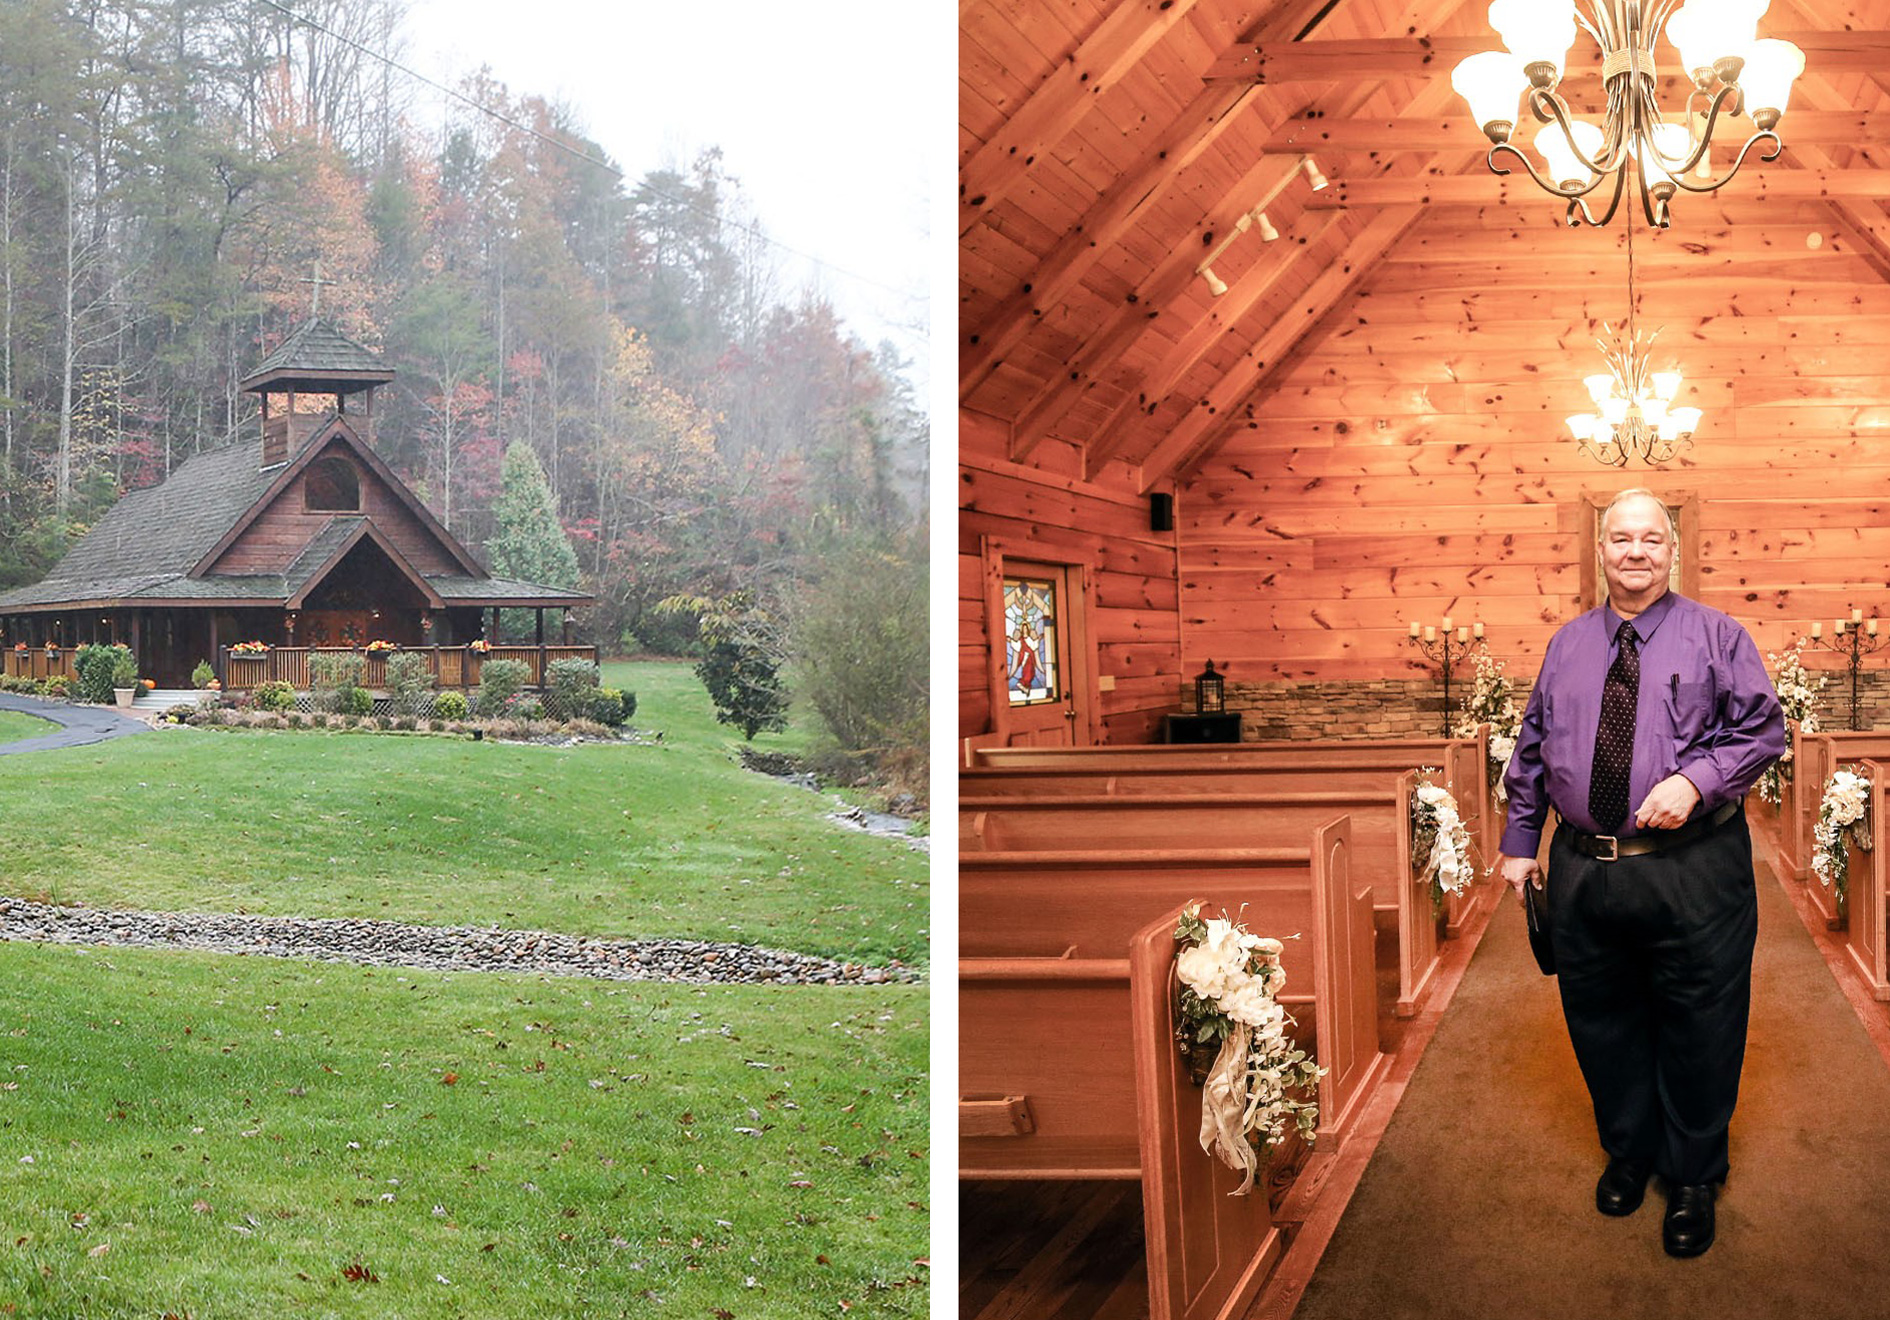 The Romantic Little Log Wedding Chapel Where Rev David Faulkner Serves As Official And Planner